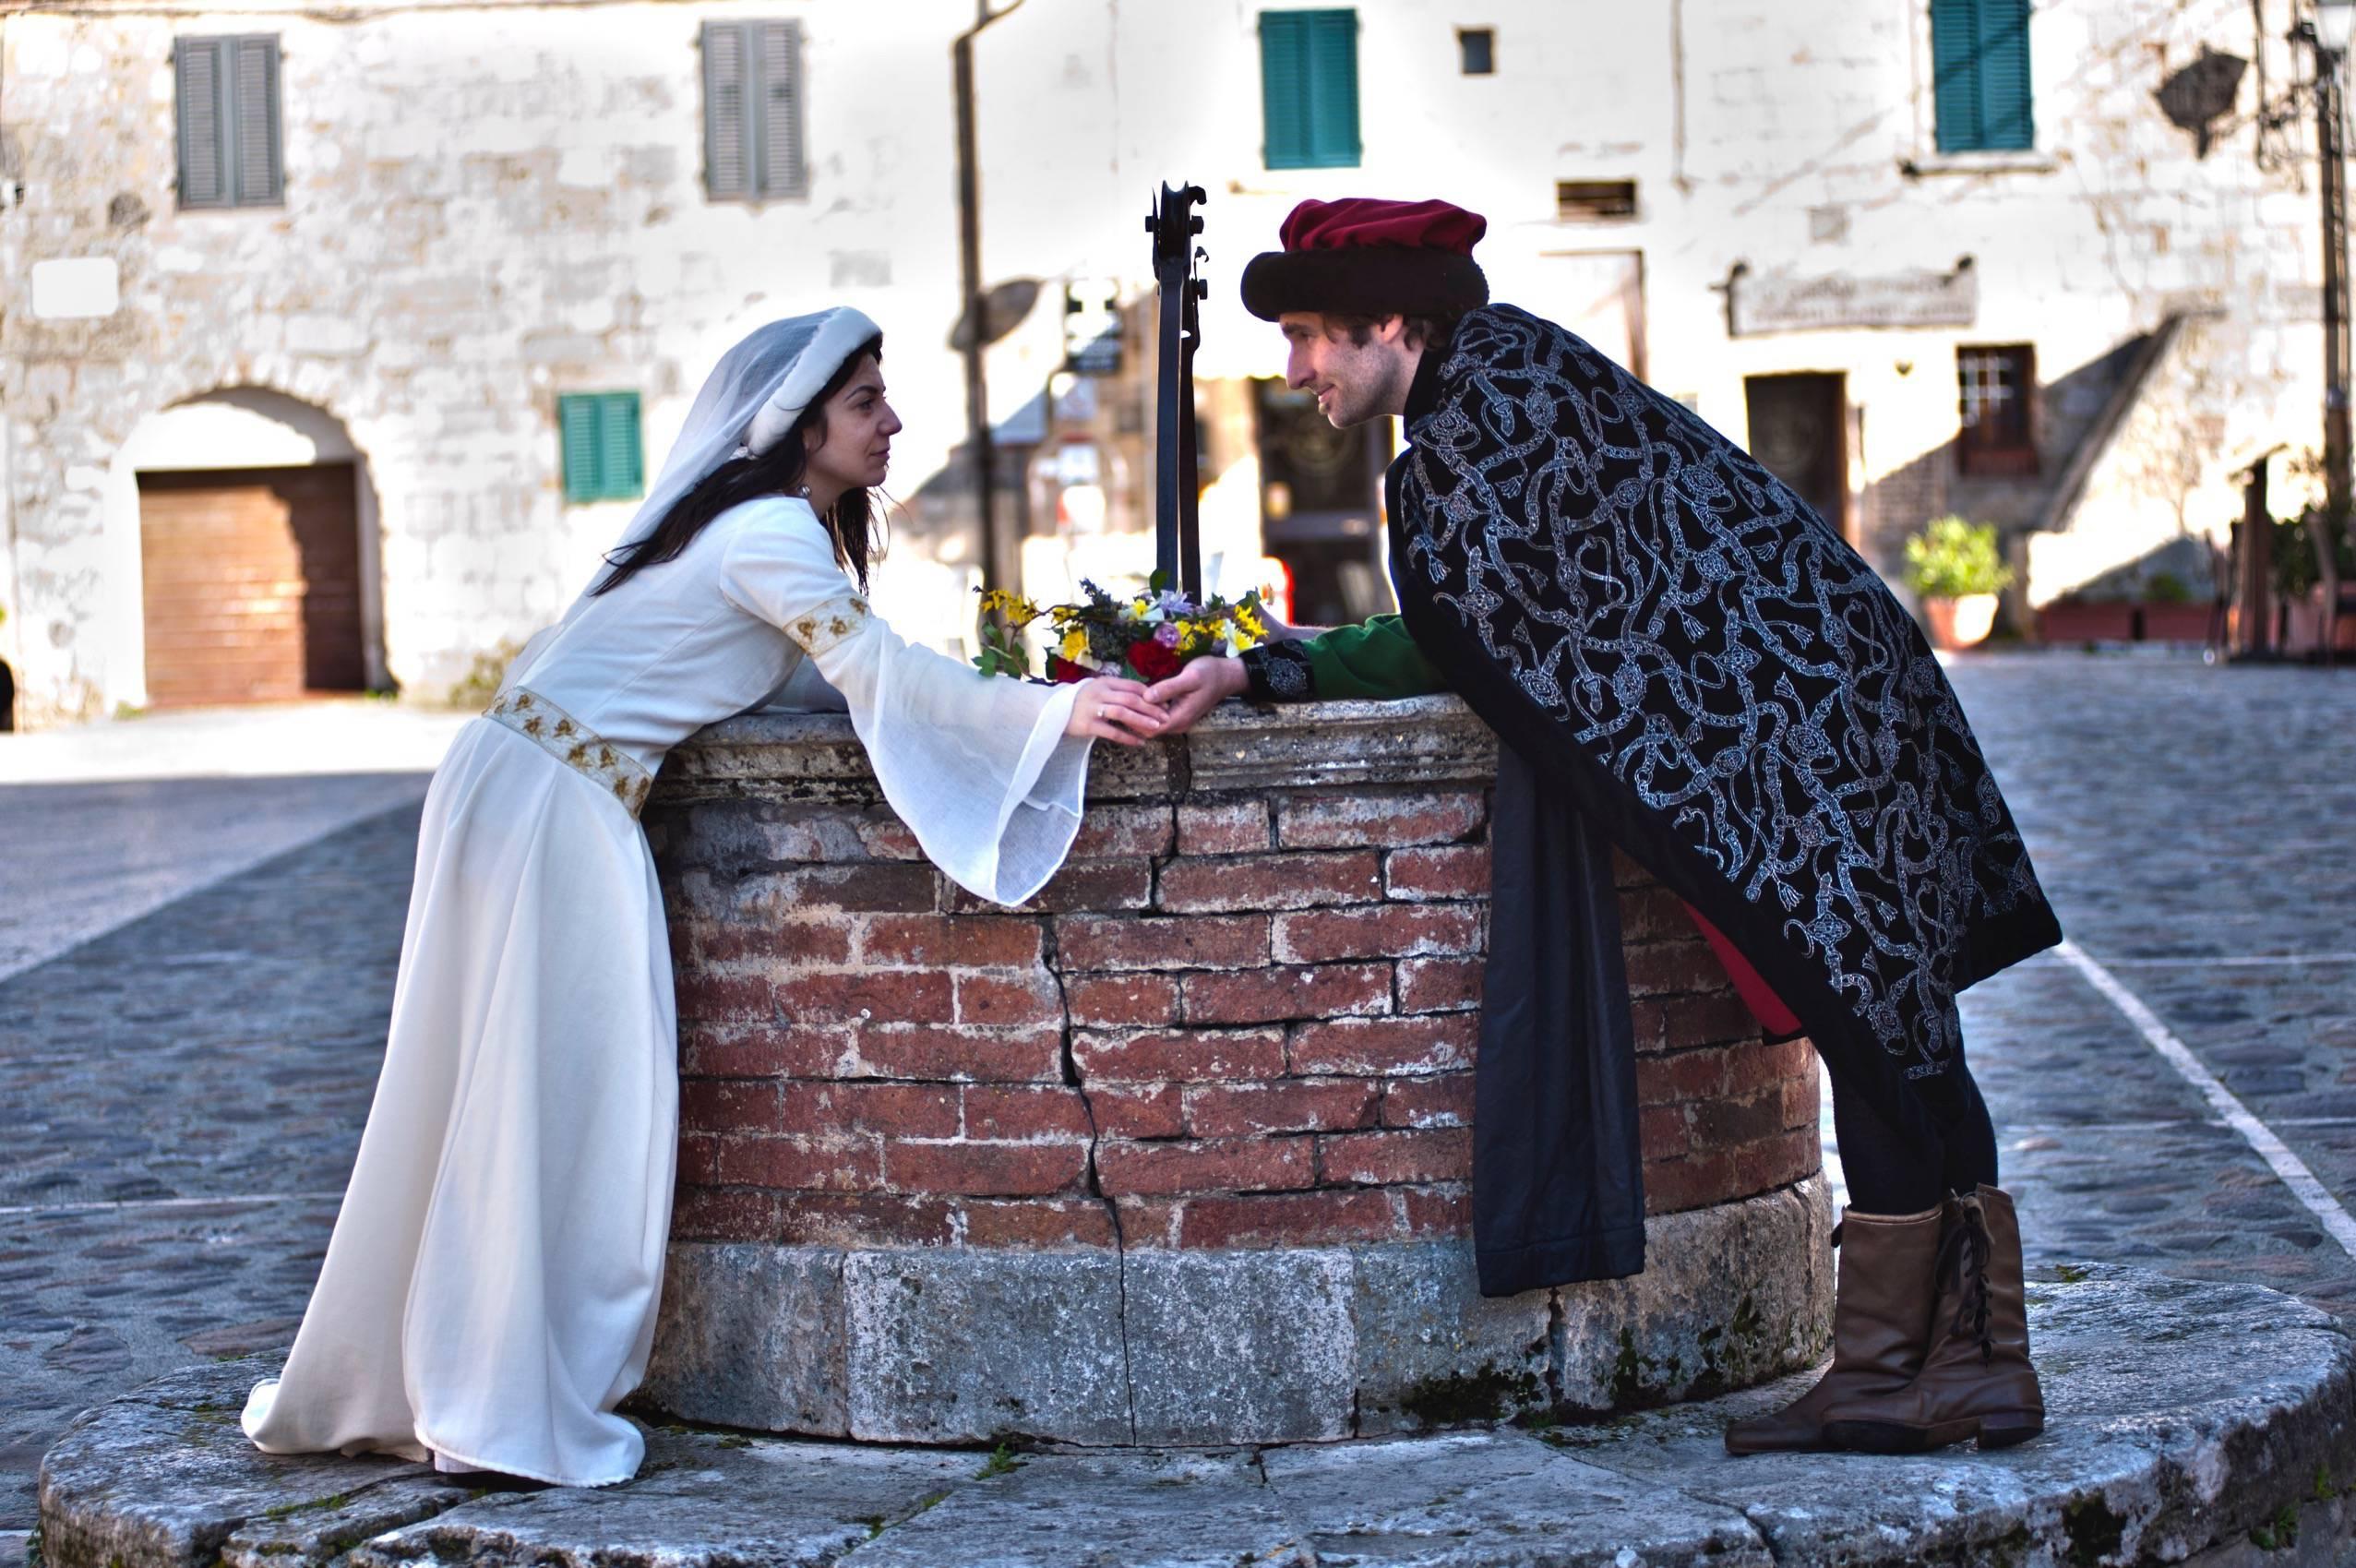 medieval wedding ceremony - HD2553×1699